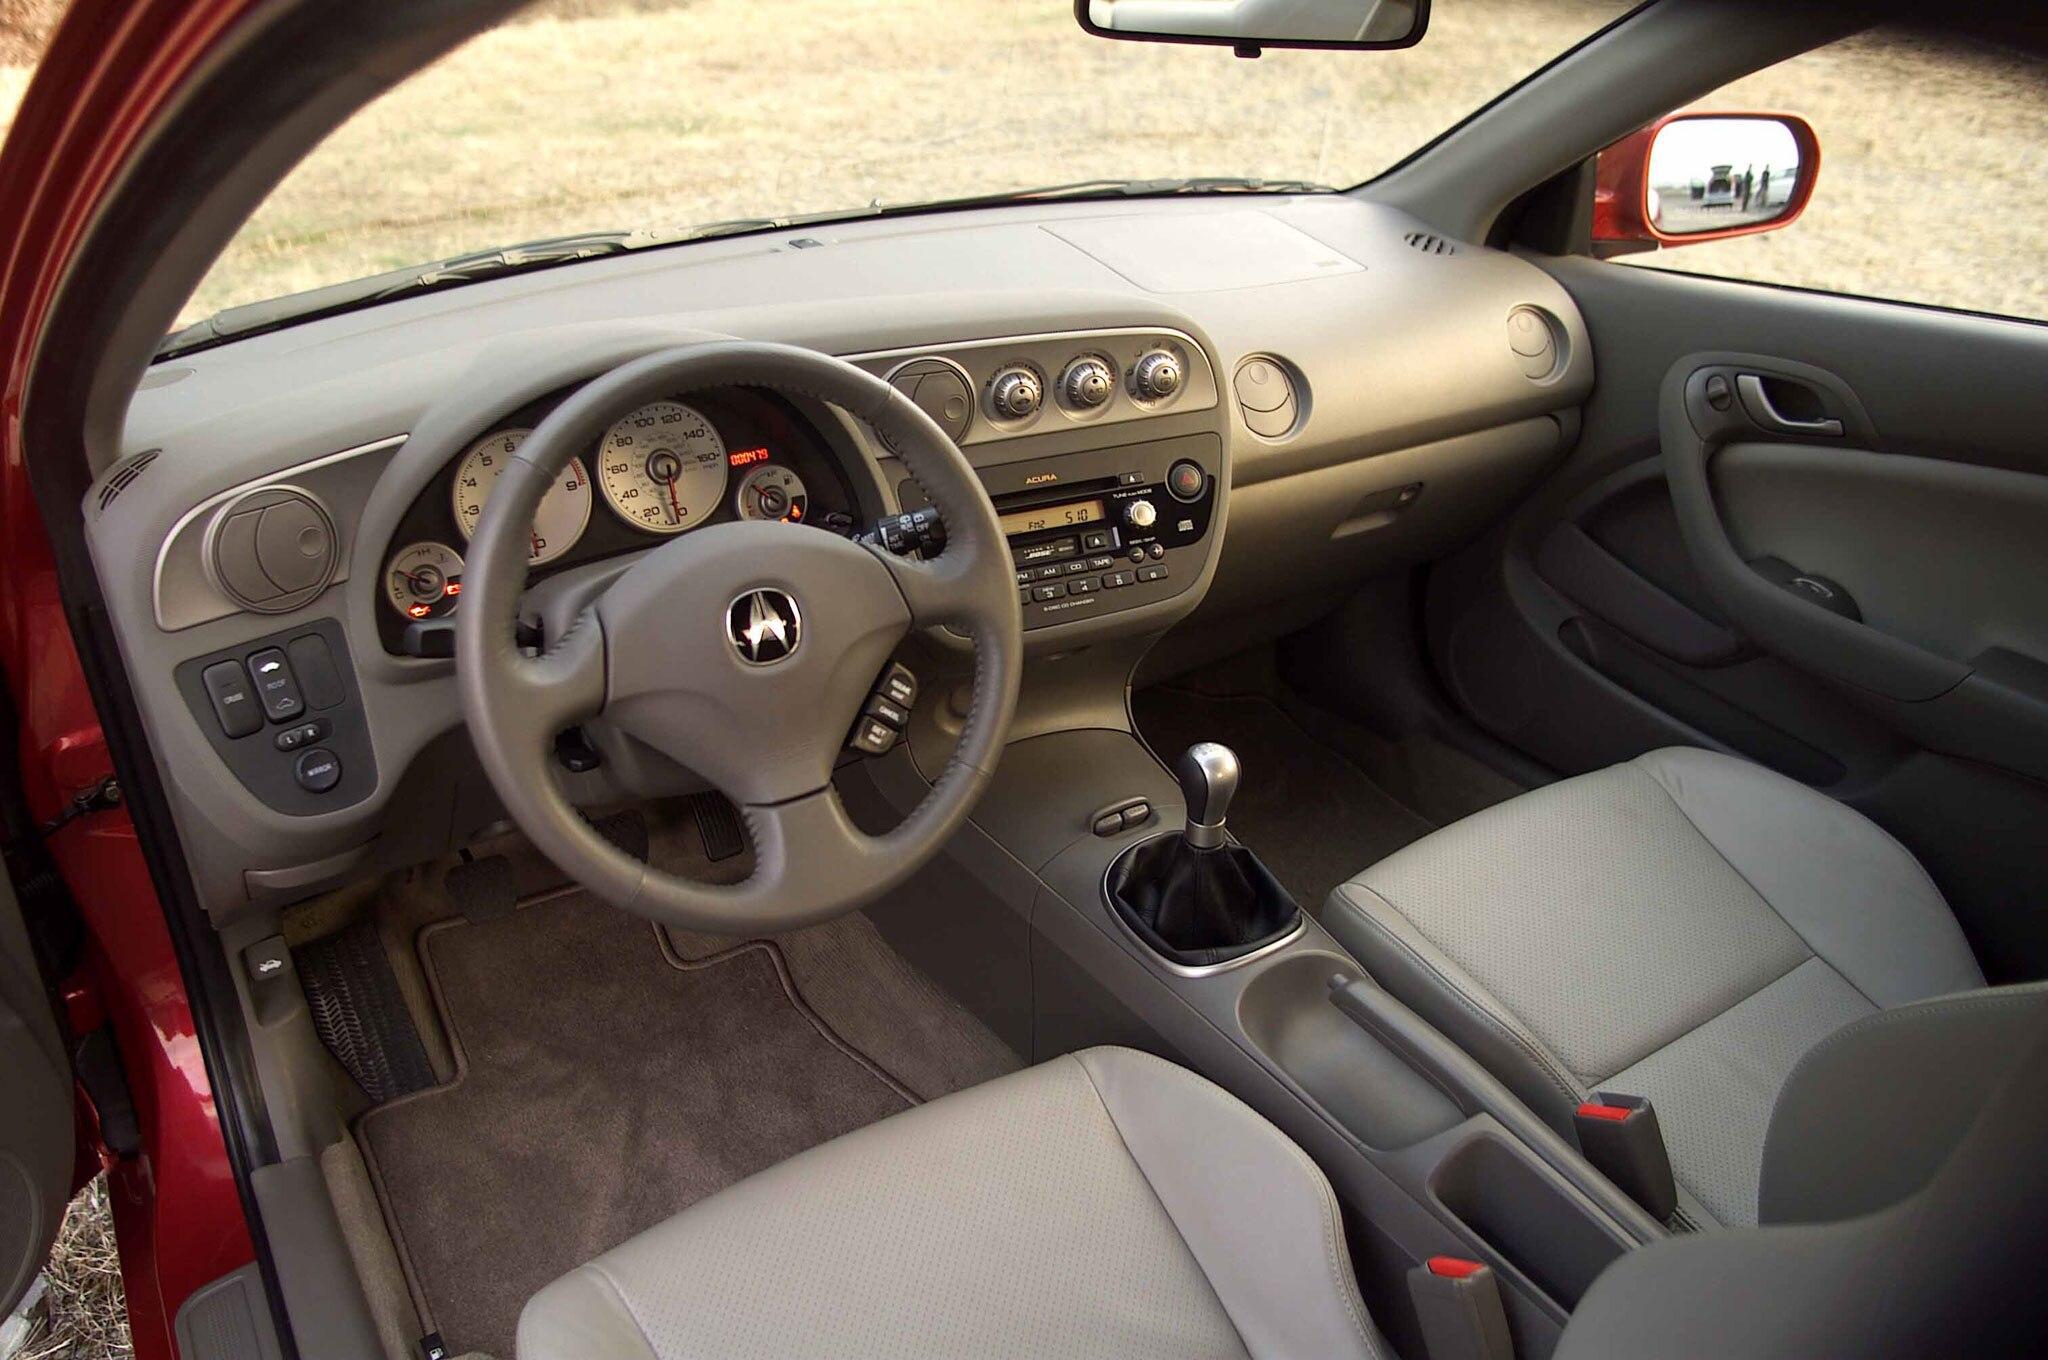 Acura Rsx Interior